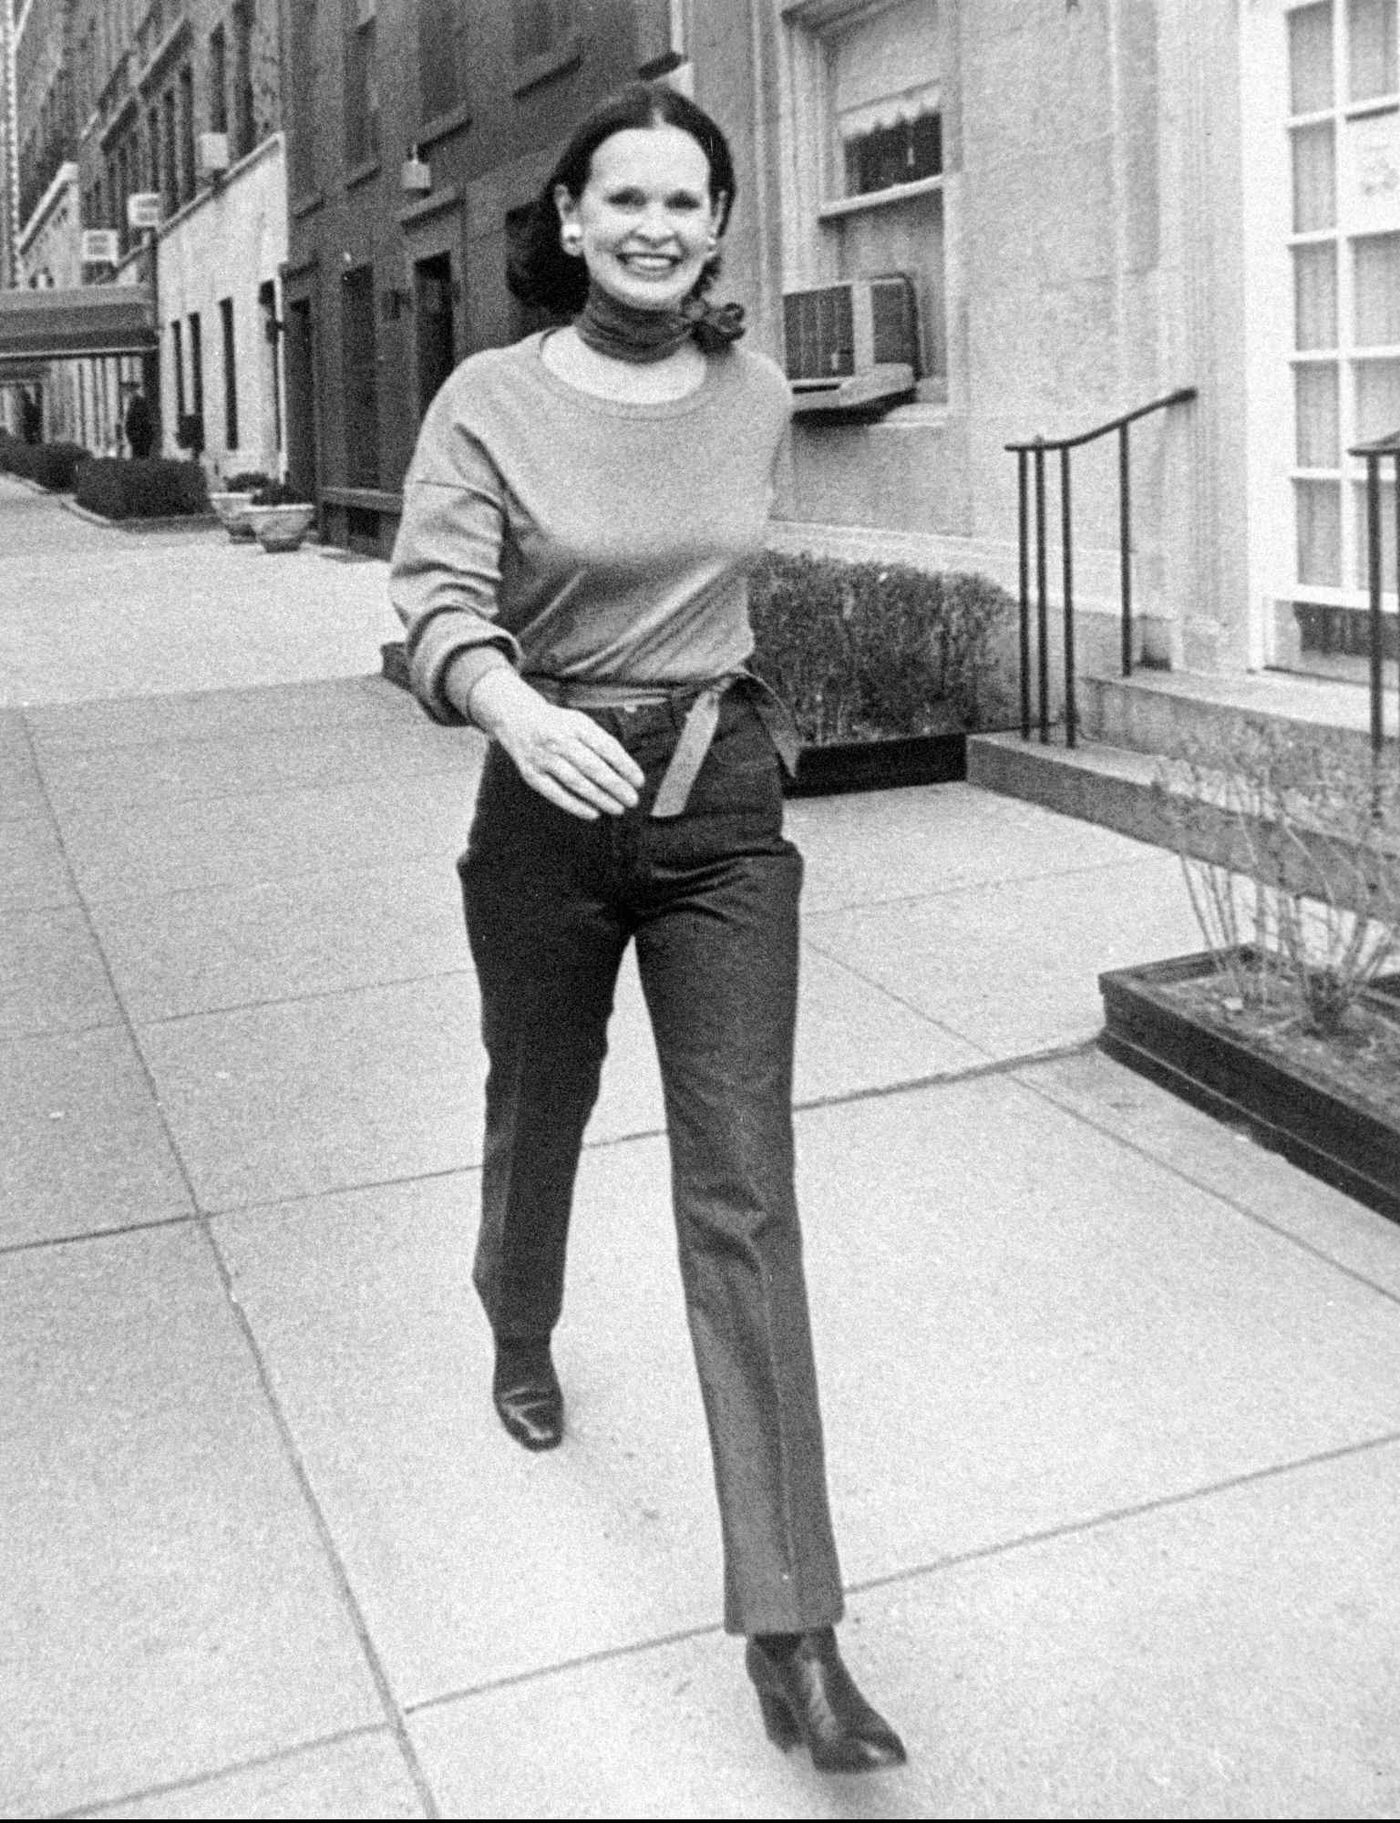 Gloria Vanderbilt has died at 95 - Chicago Sun-Times